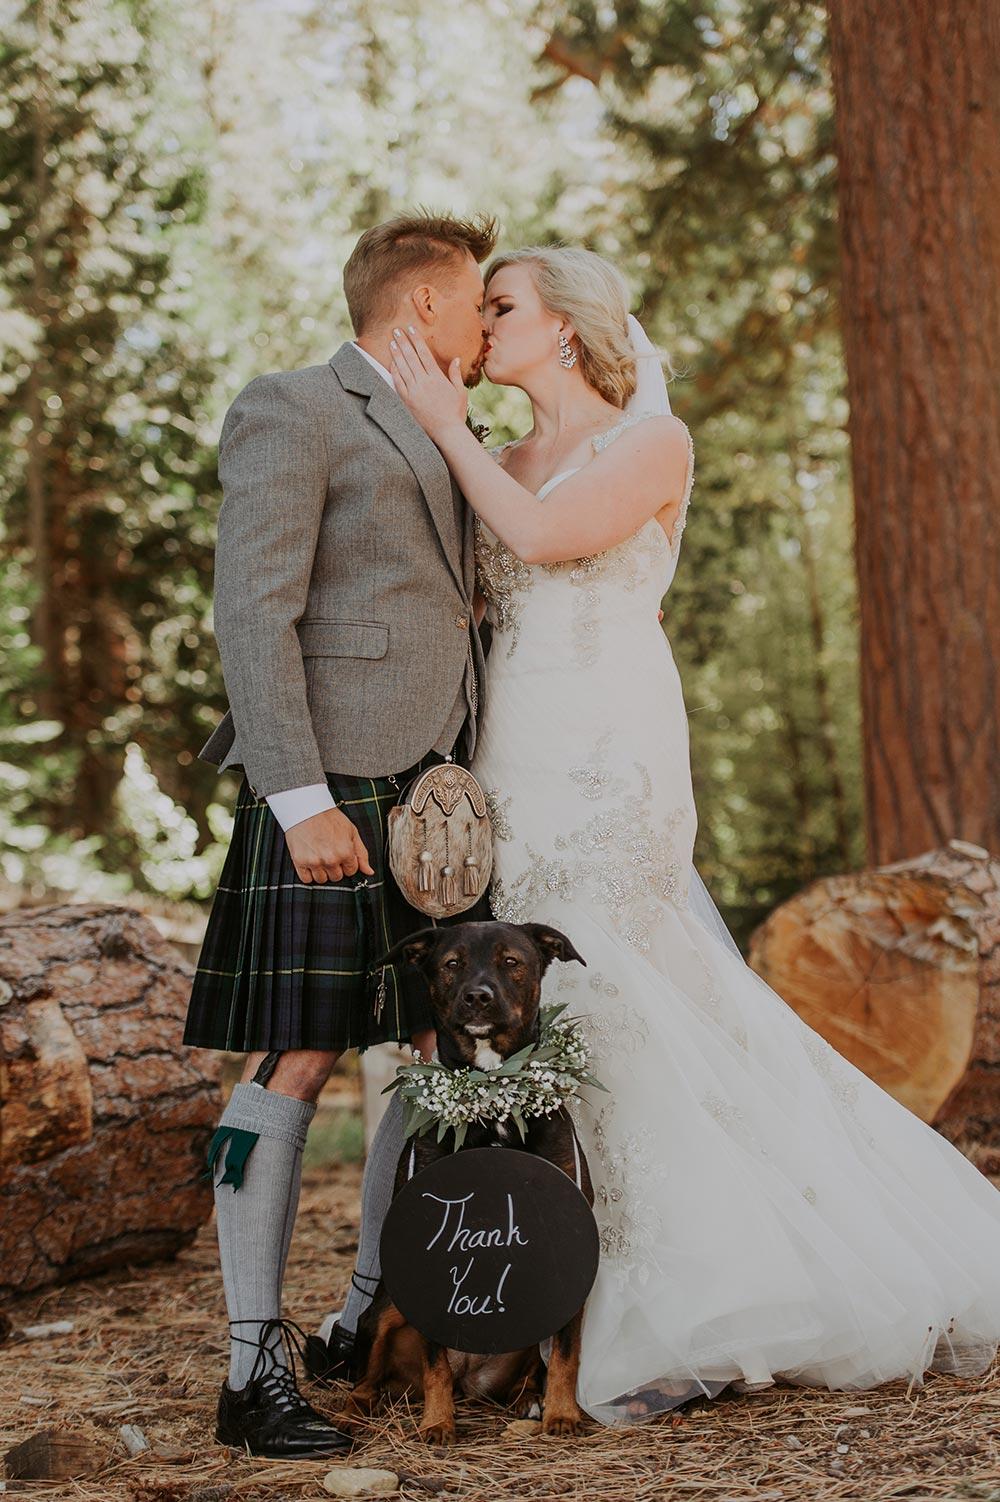 Woodsy Lake Tahoe Wedding #woodsywedding #weddingkilt #laketahoewedding #weddingvenueideas